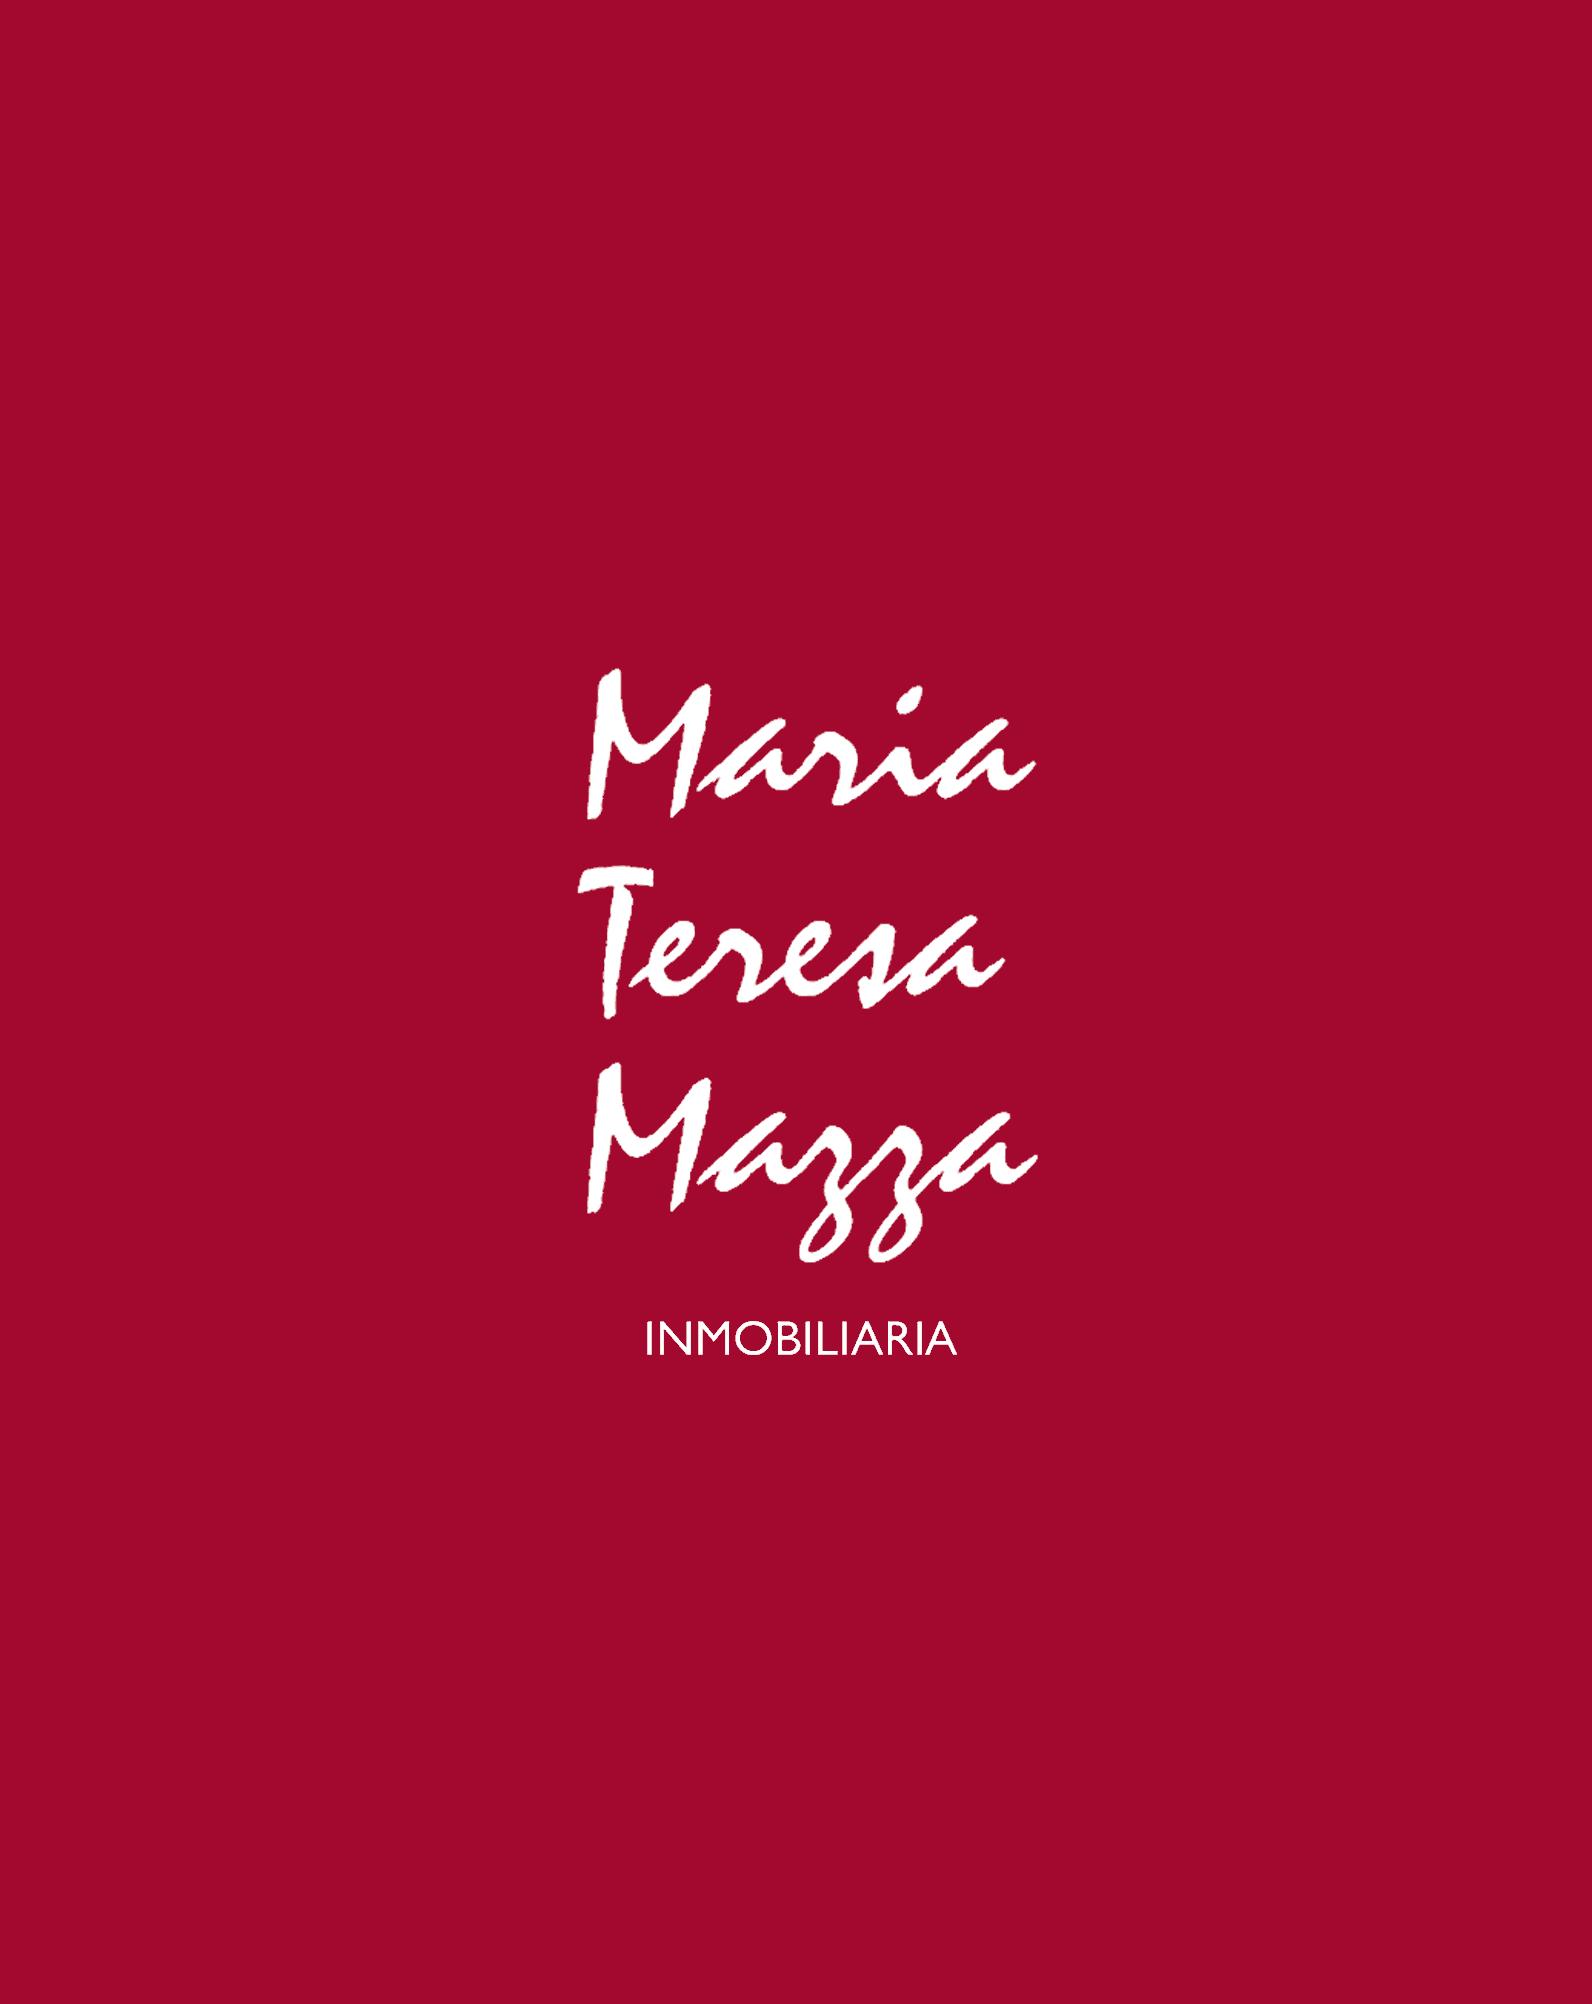 Logo de  Maria Teresa Mazza Inmobiliaria